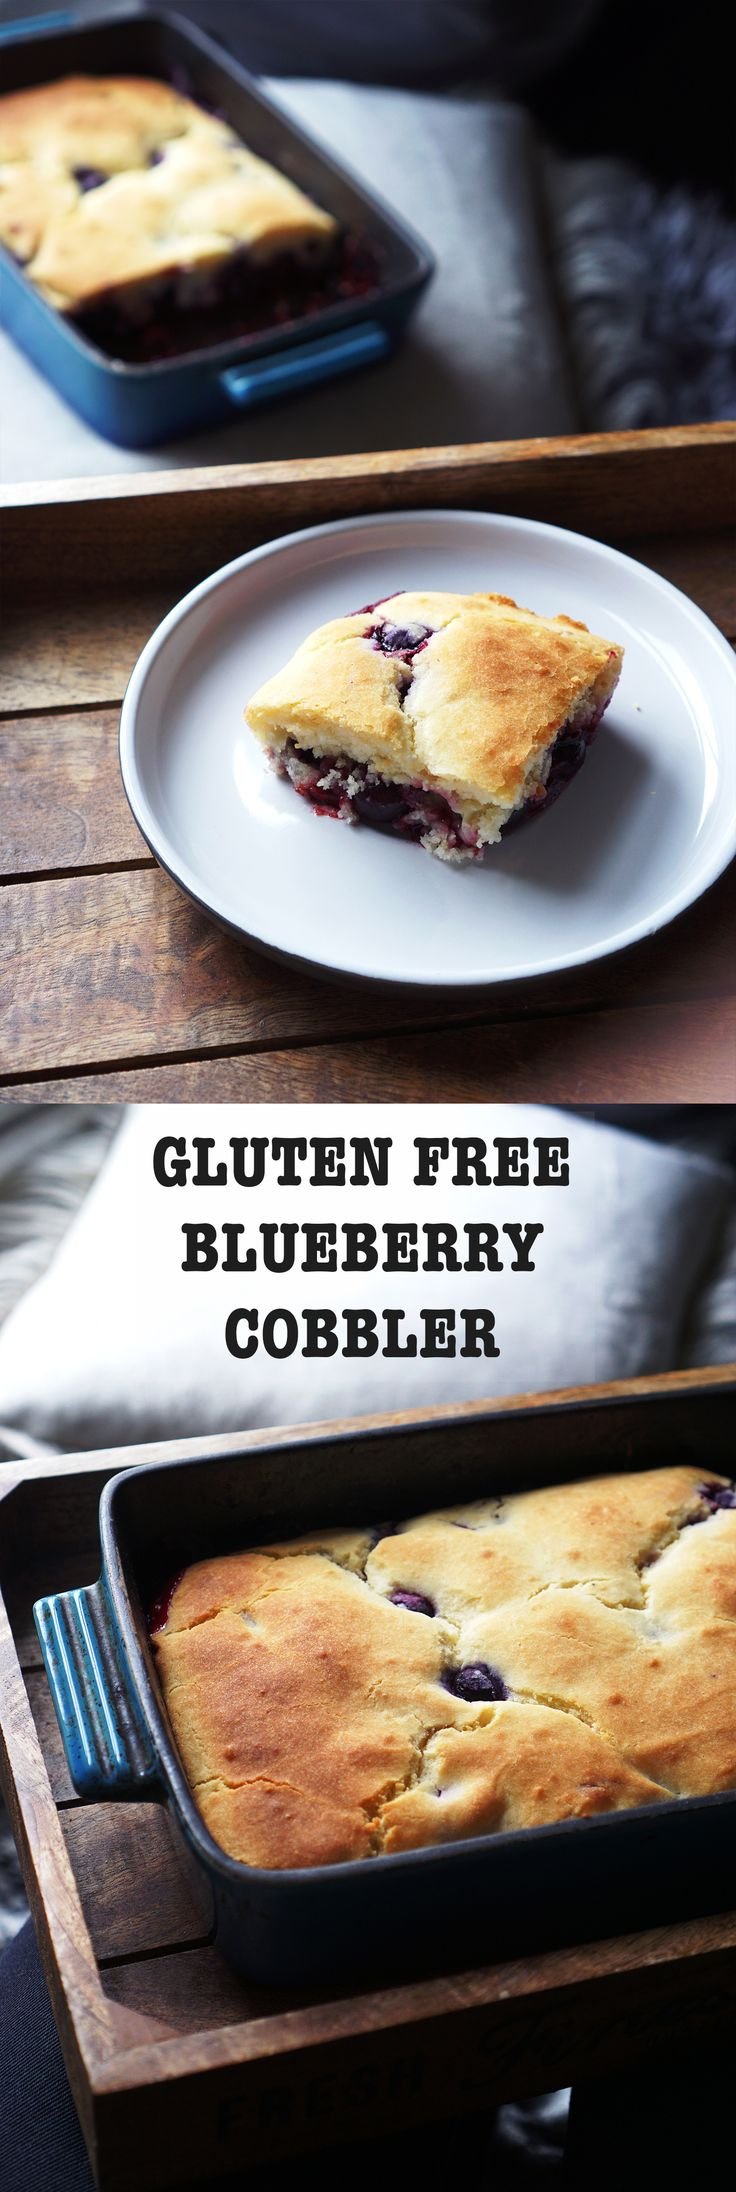 Gluten Free Blueberry Cobbler | #cobbler #blueberry #glutenfree #recipe #food #baking #coeliac